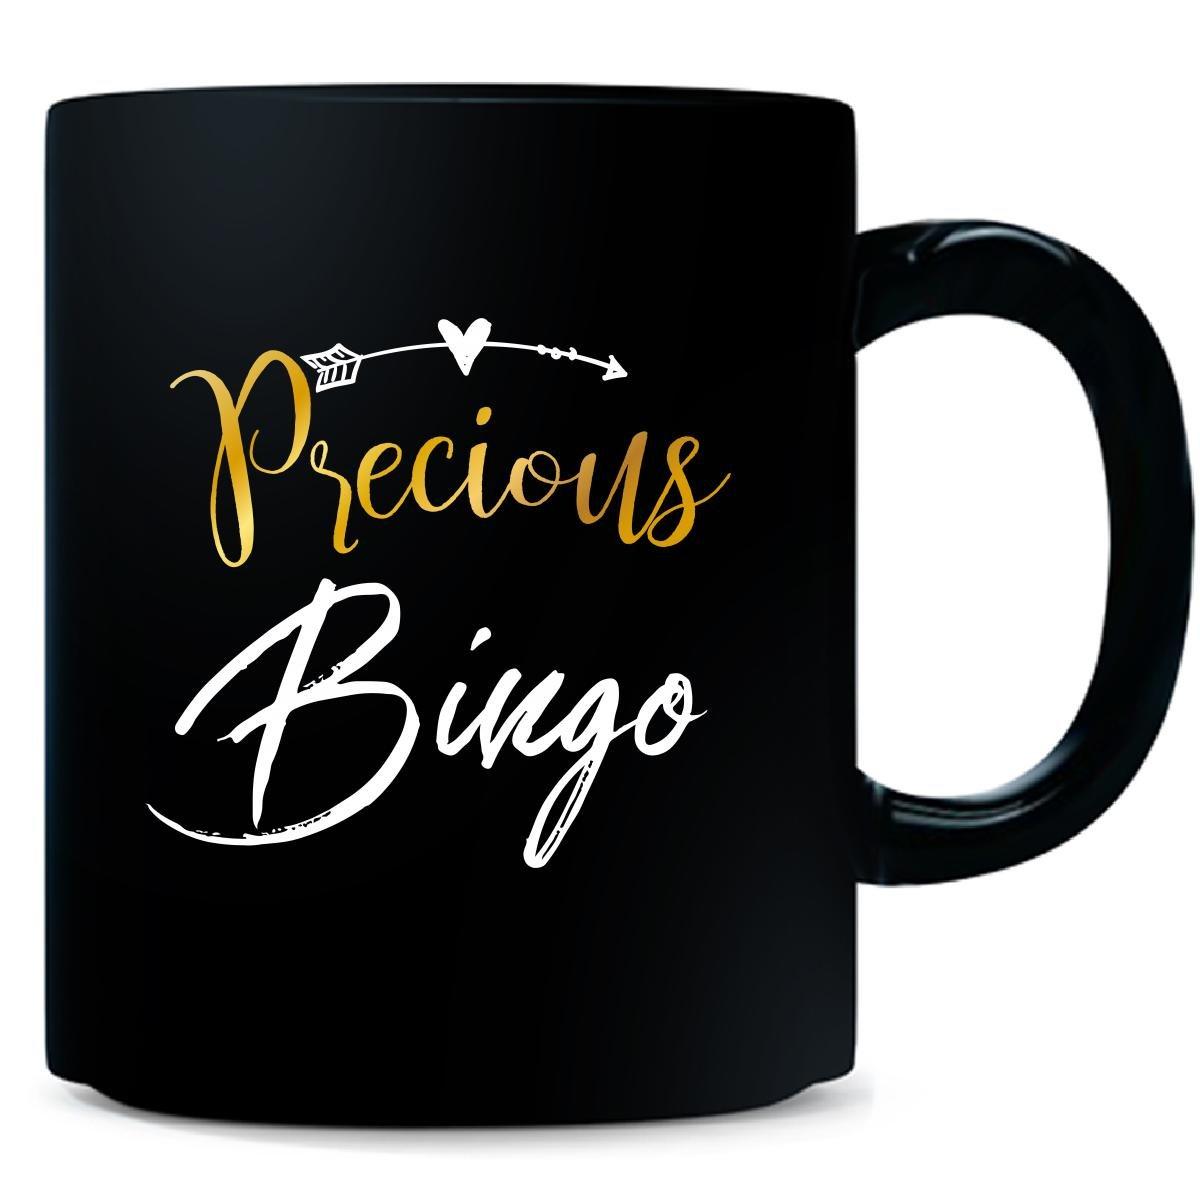 Precious Bingo Name Mothers Day Present Grandma - Mug by My Family Tee